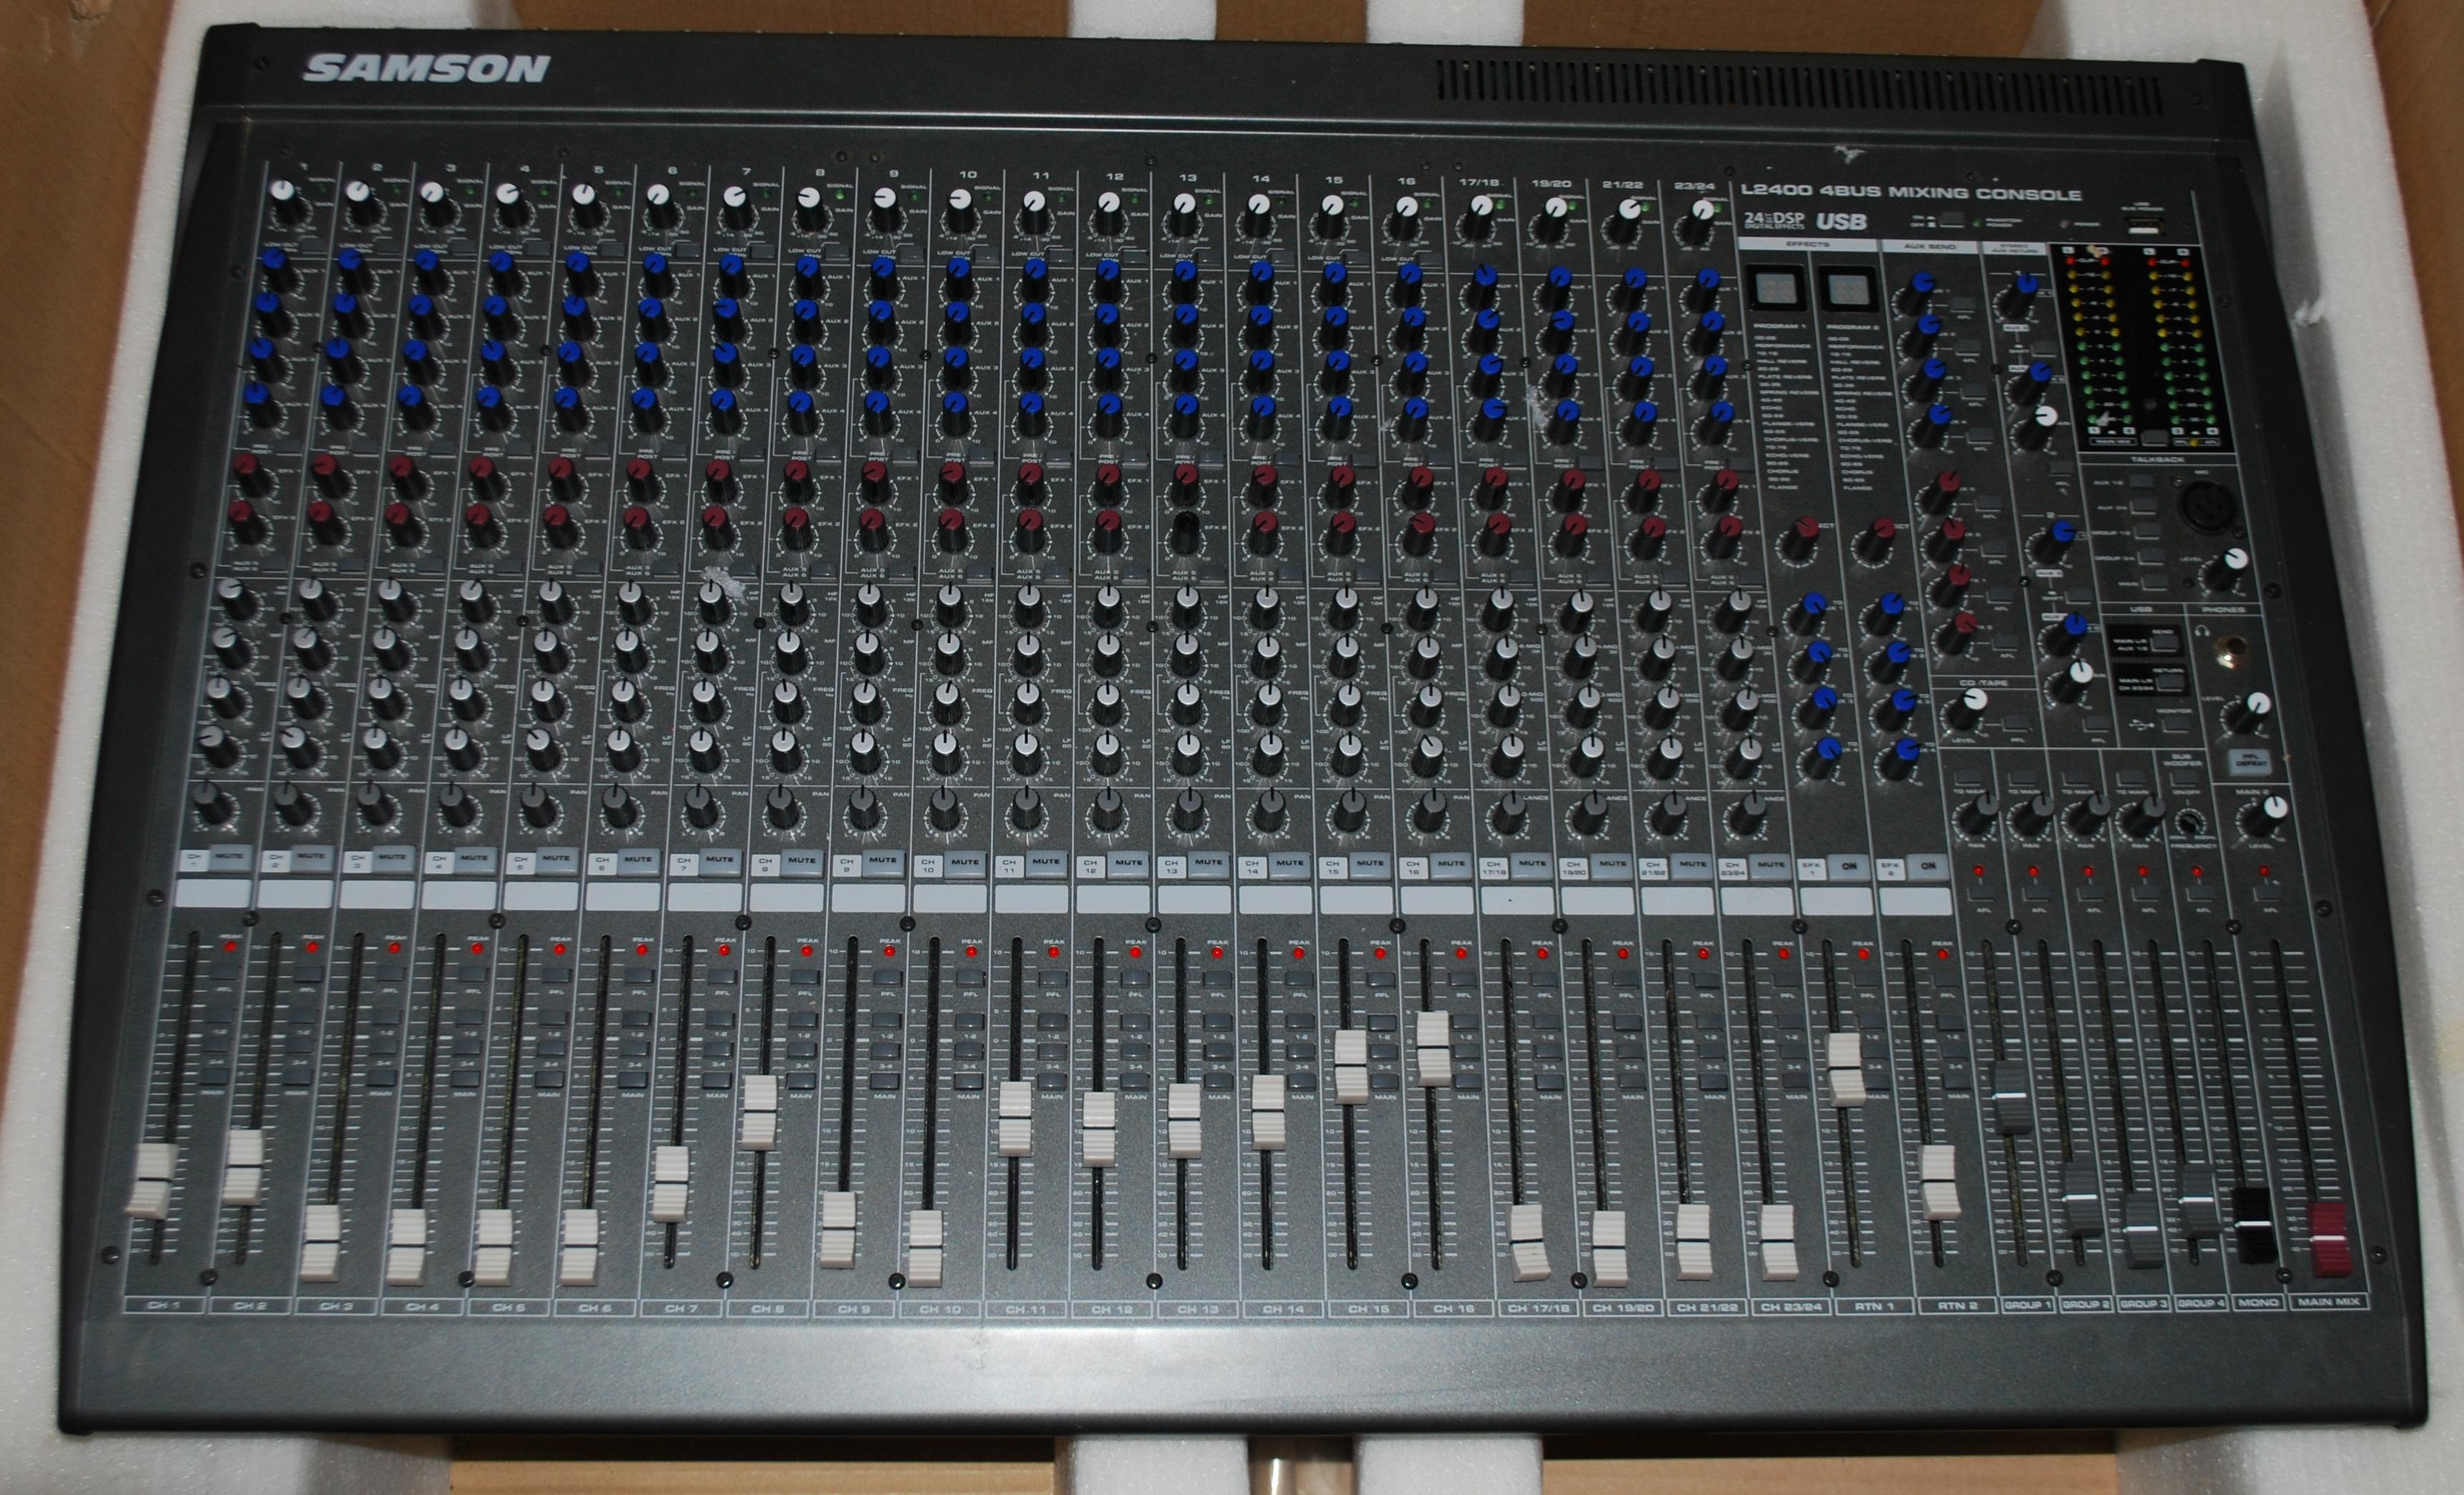 table de mixage samson l2400 auvergne audiofanzine. Black Bedroom Furniture Sets. Home Design Ideas